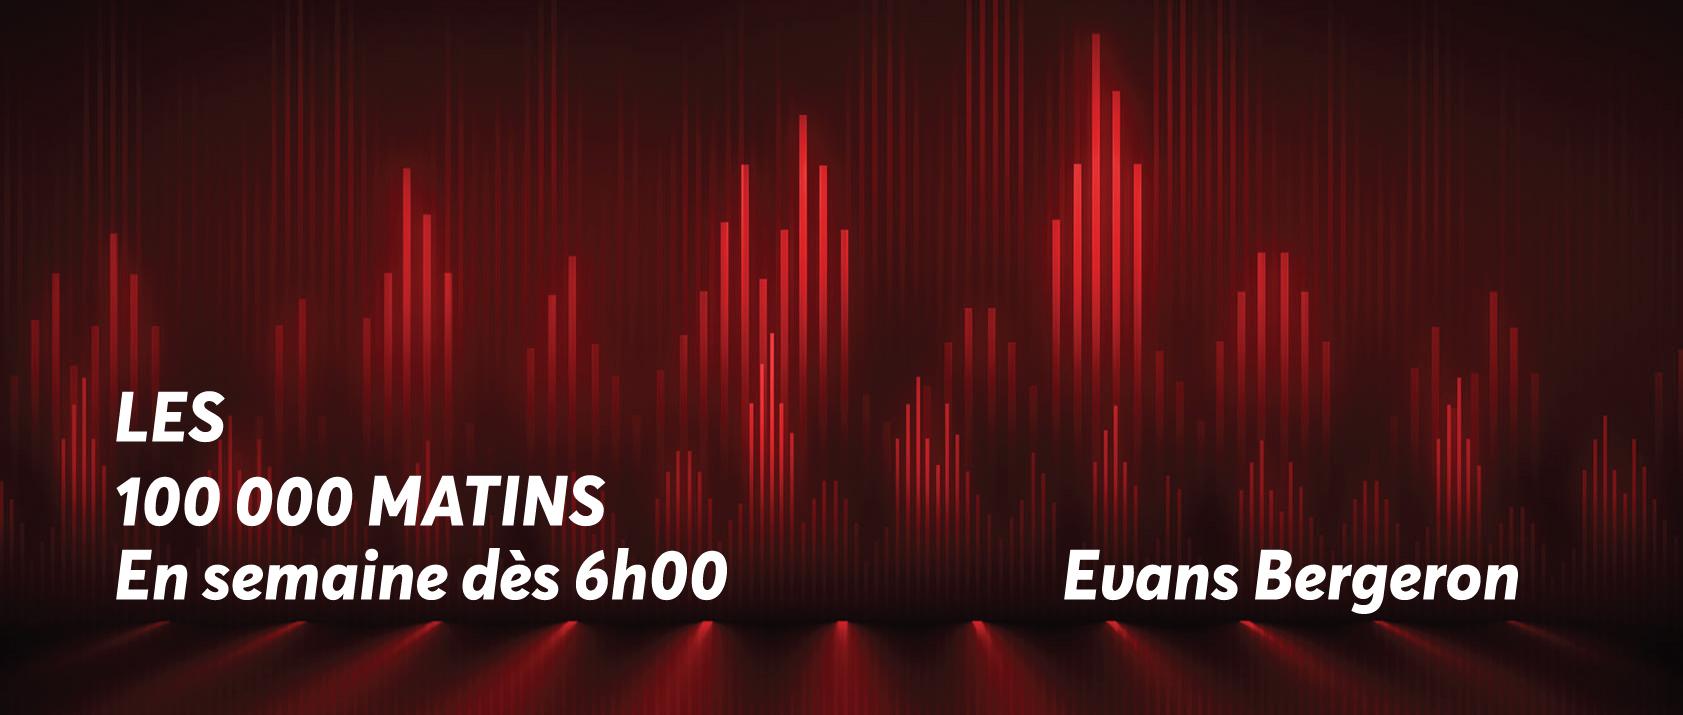 100-000-evans